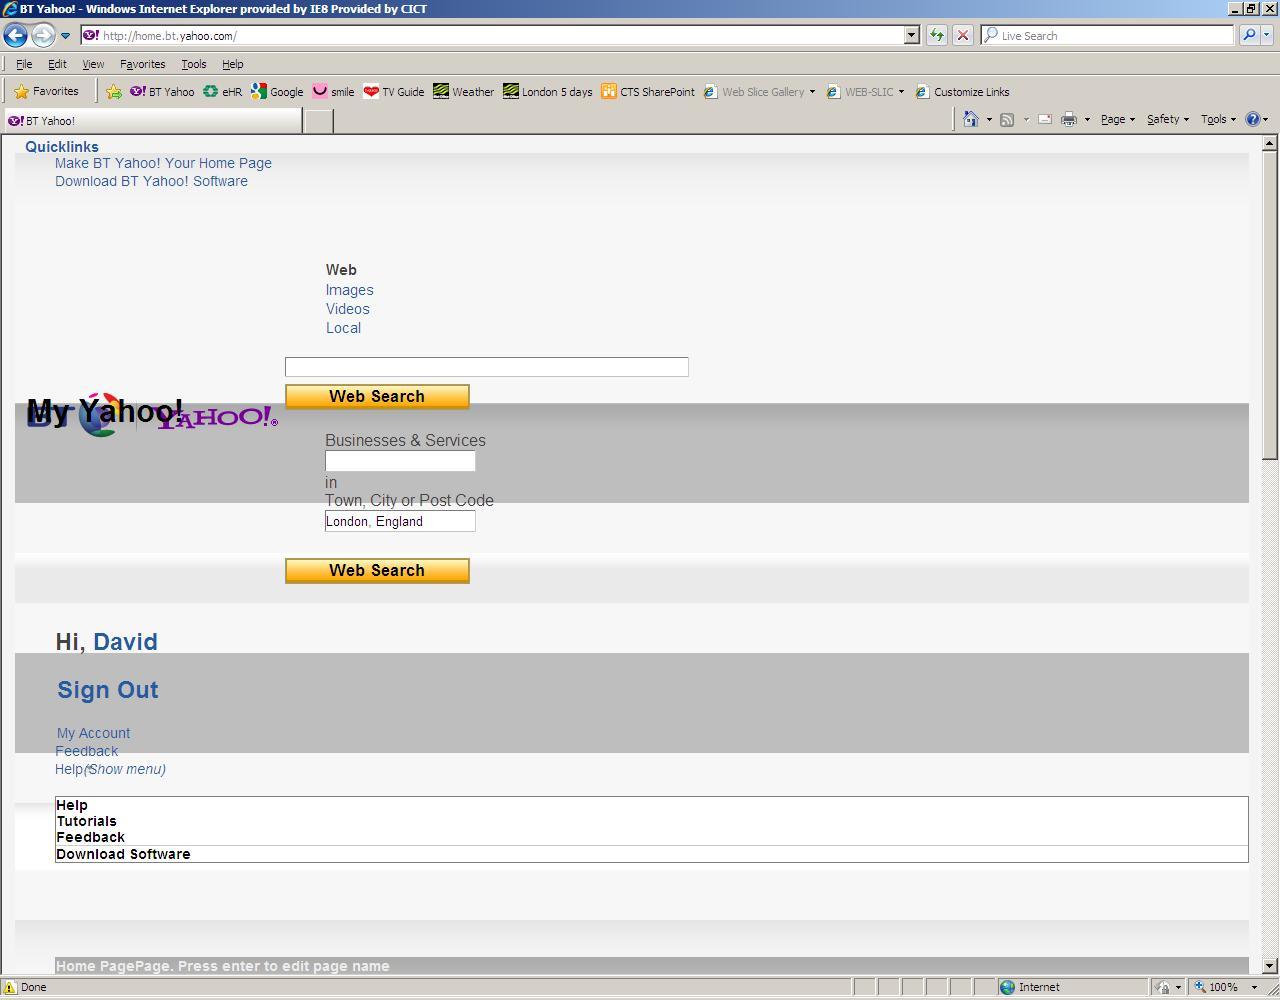 5 Ways to Make Yahoo Your Homepage - wikiHow